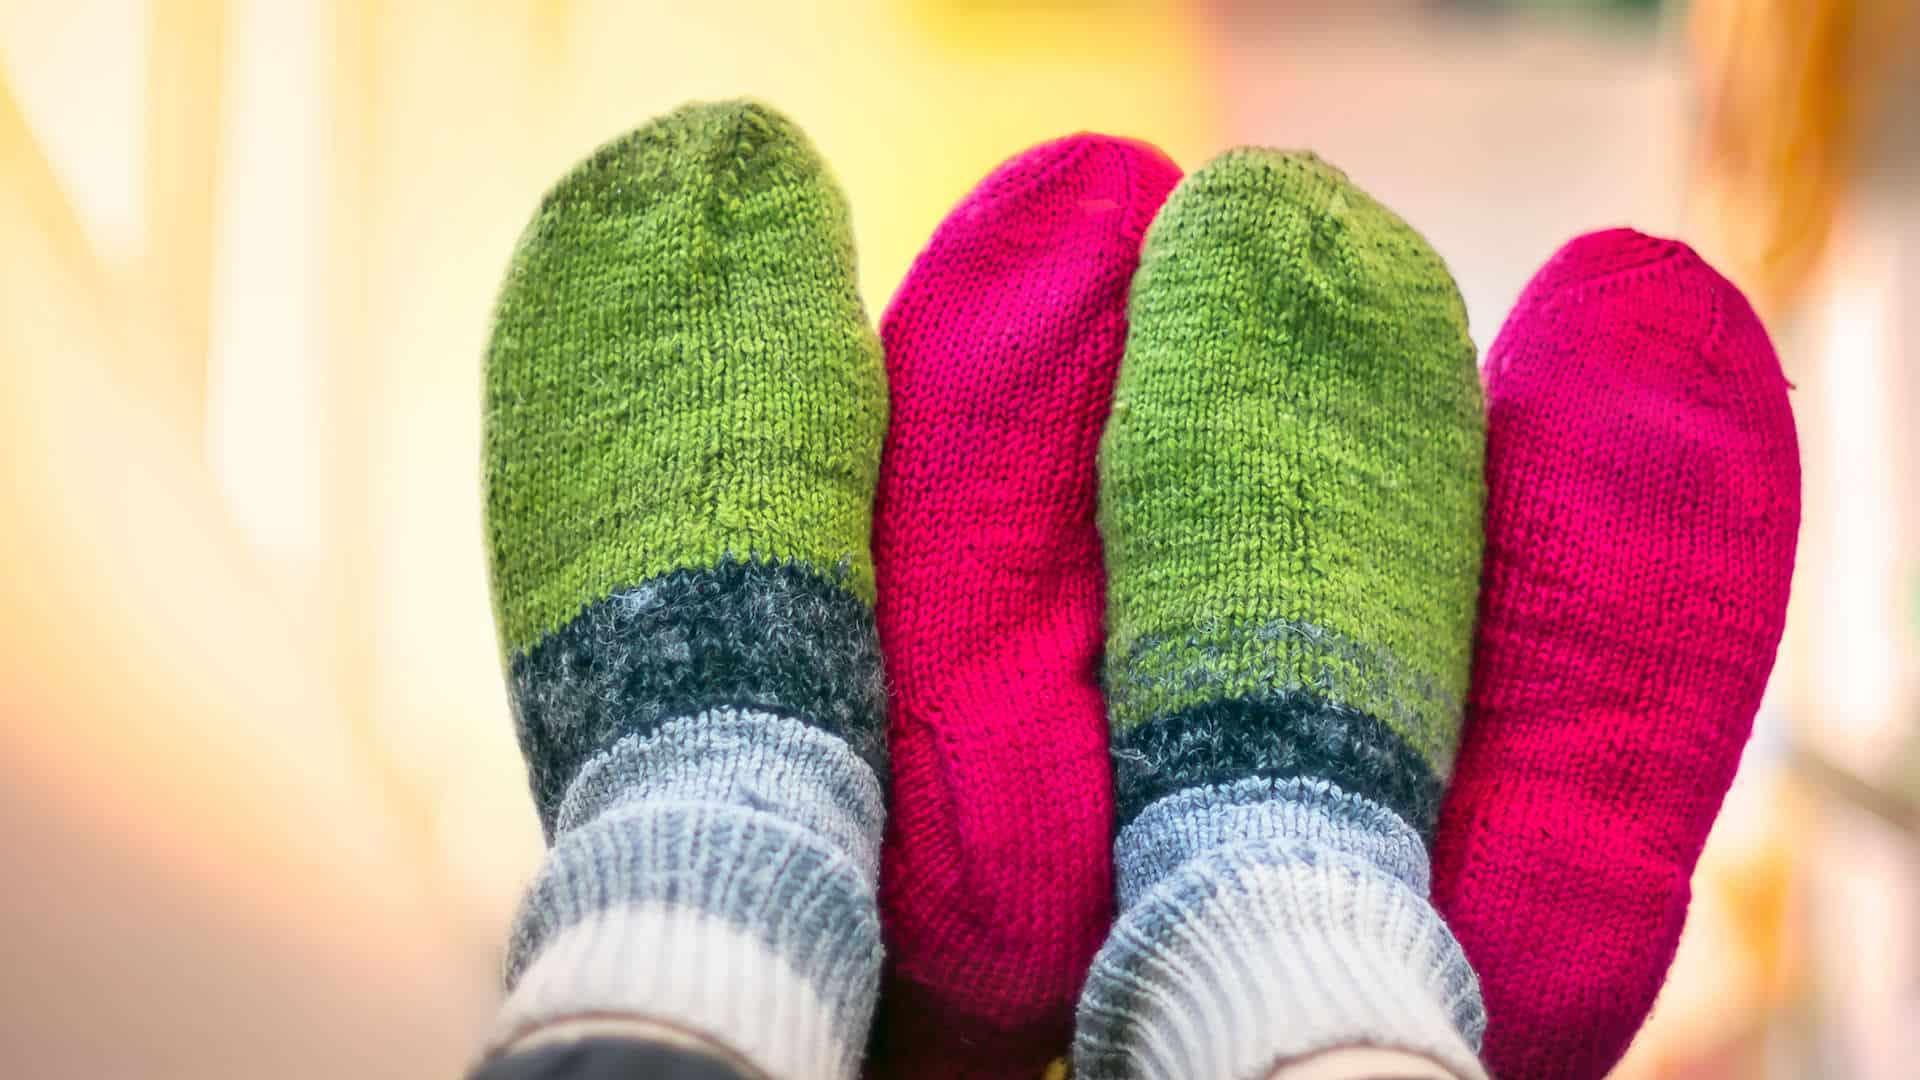 Dicke Socken bedeuten Glück